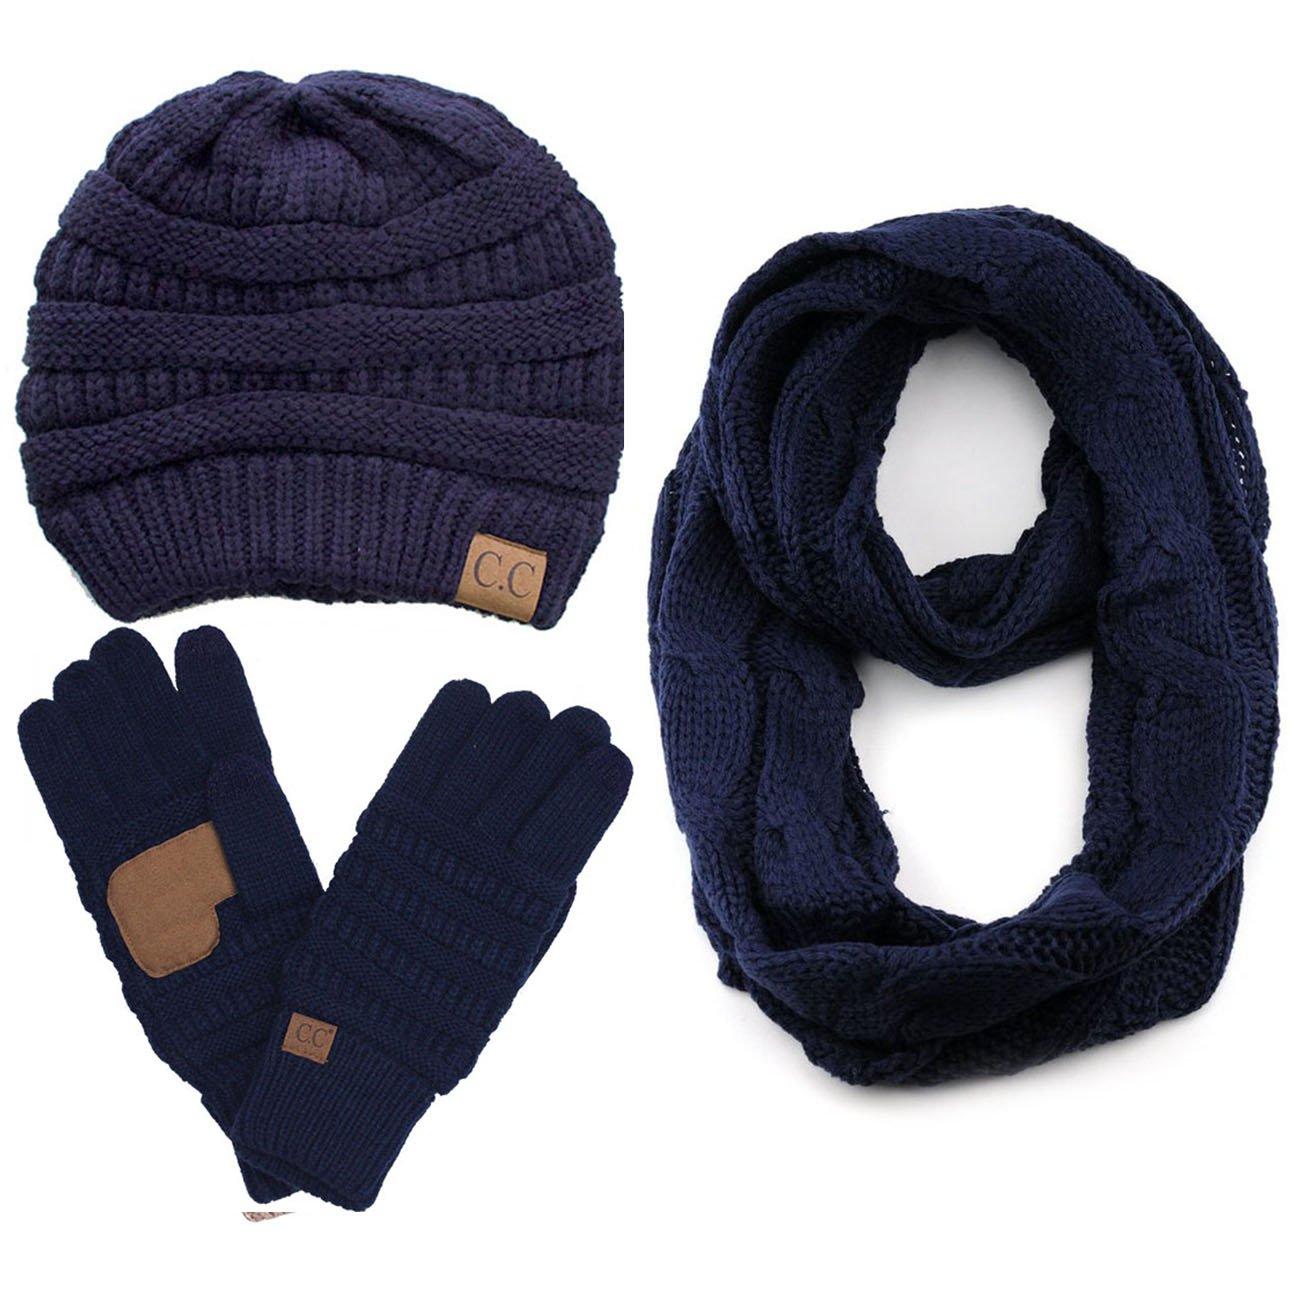 ScarvesMe CC 3pc Set Trendy Warm Chunky Soft Stretch Cable Knit Beanie Scarves Gloves Set (Navy)